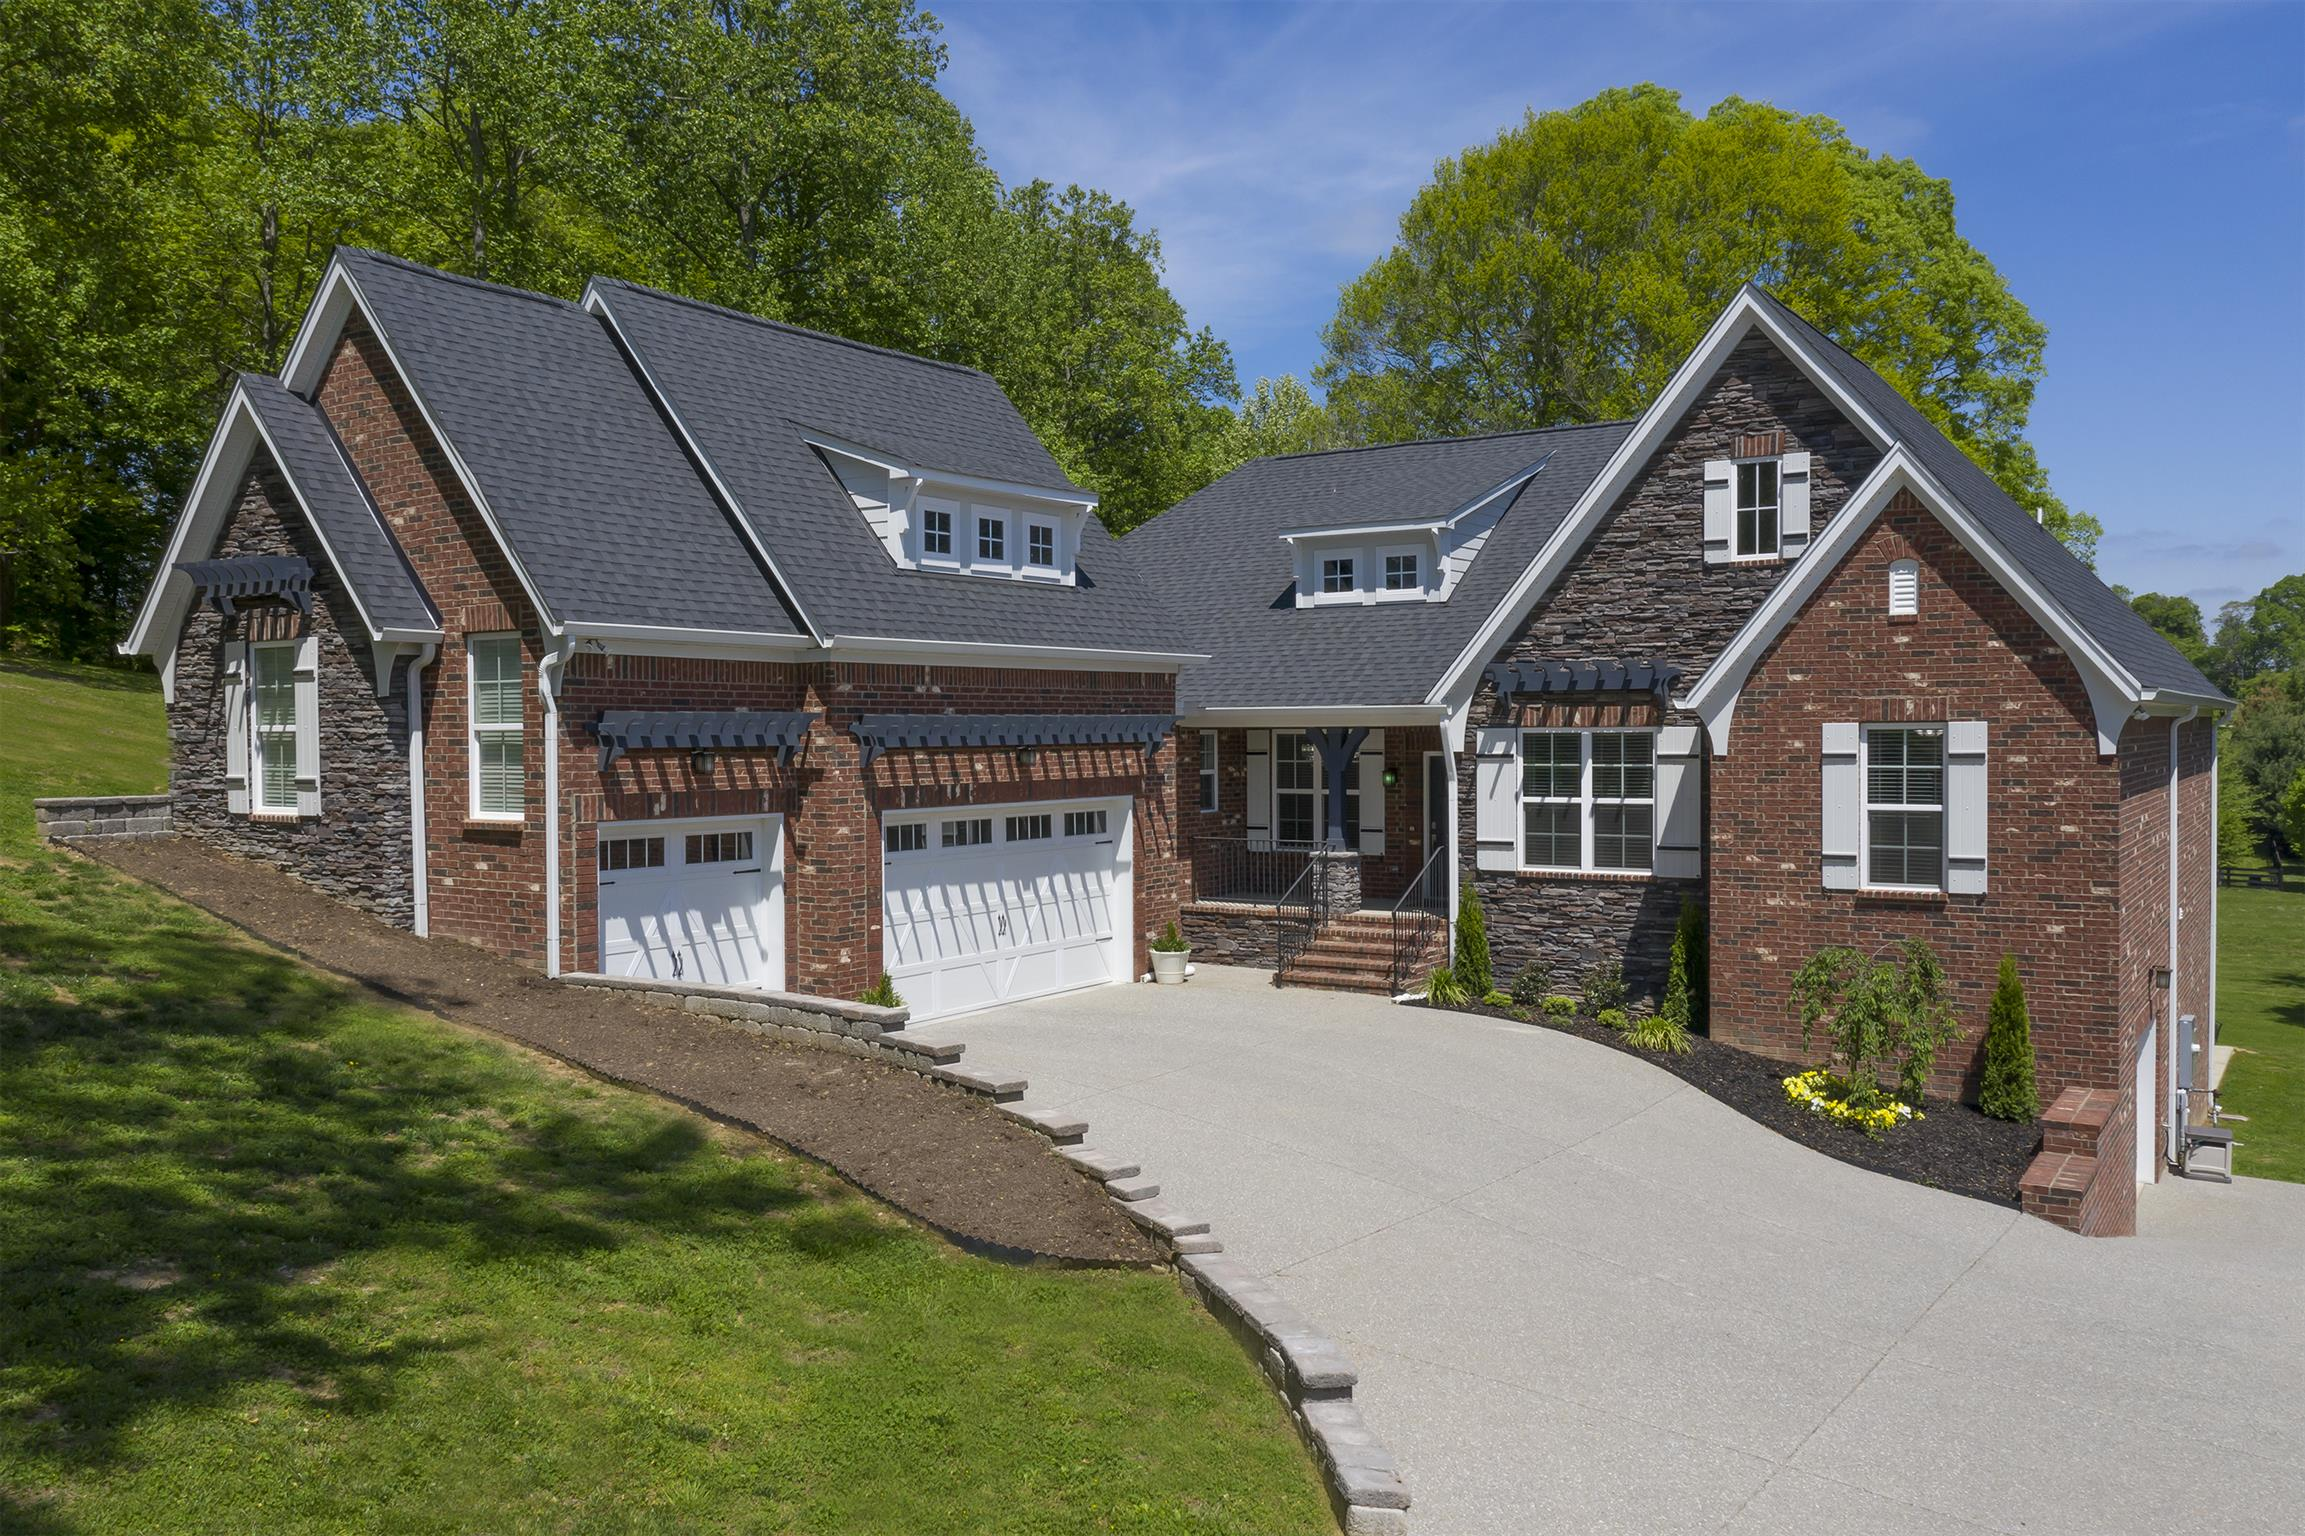 2242 Brienz Valley Dr, Franklin, TN 37064 - Franklin, TN real estate listing